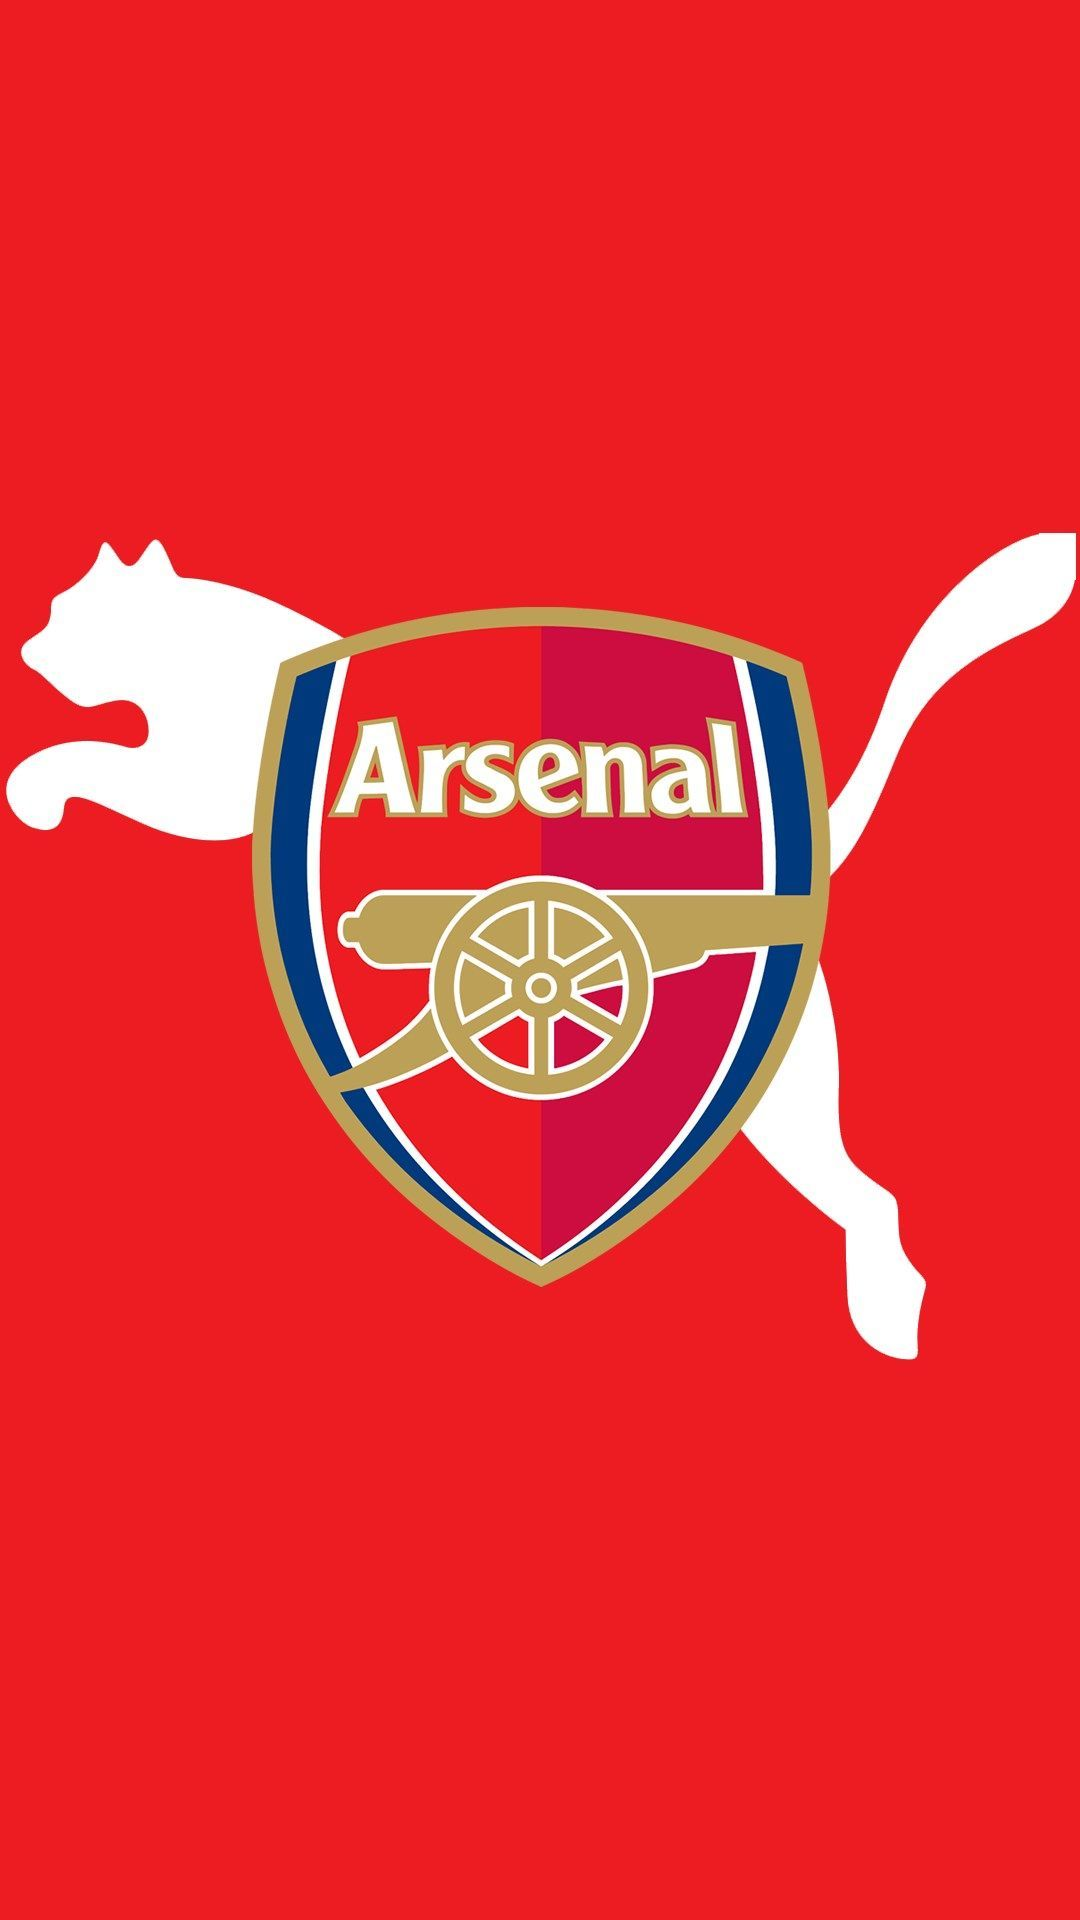 Arsenal Wallpaper For Mobile Hd Football Arsenal Wallpapers Arsenal Badge Arsenal